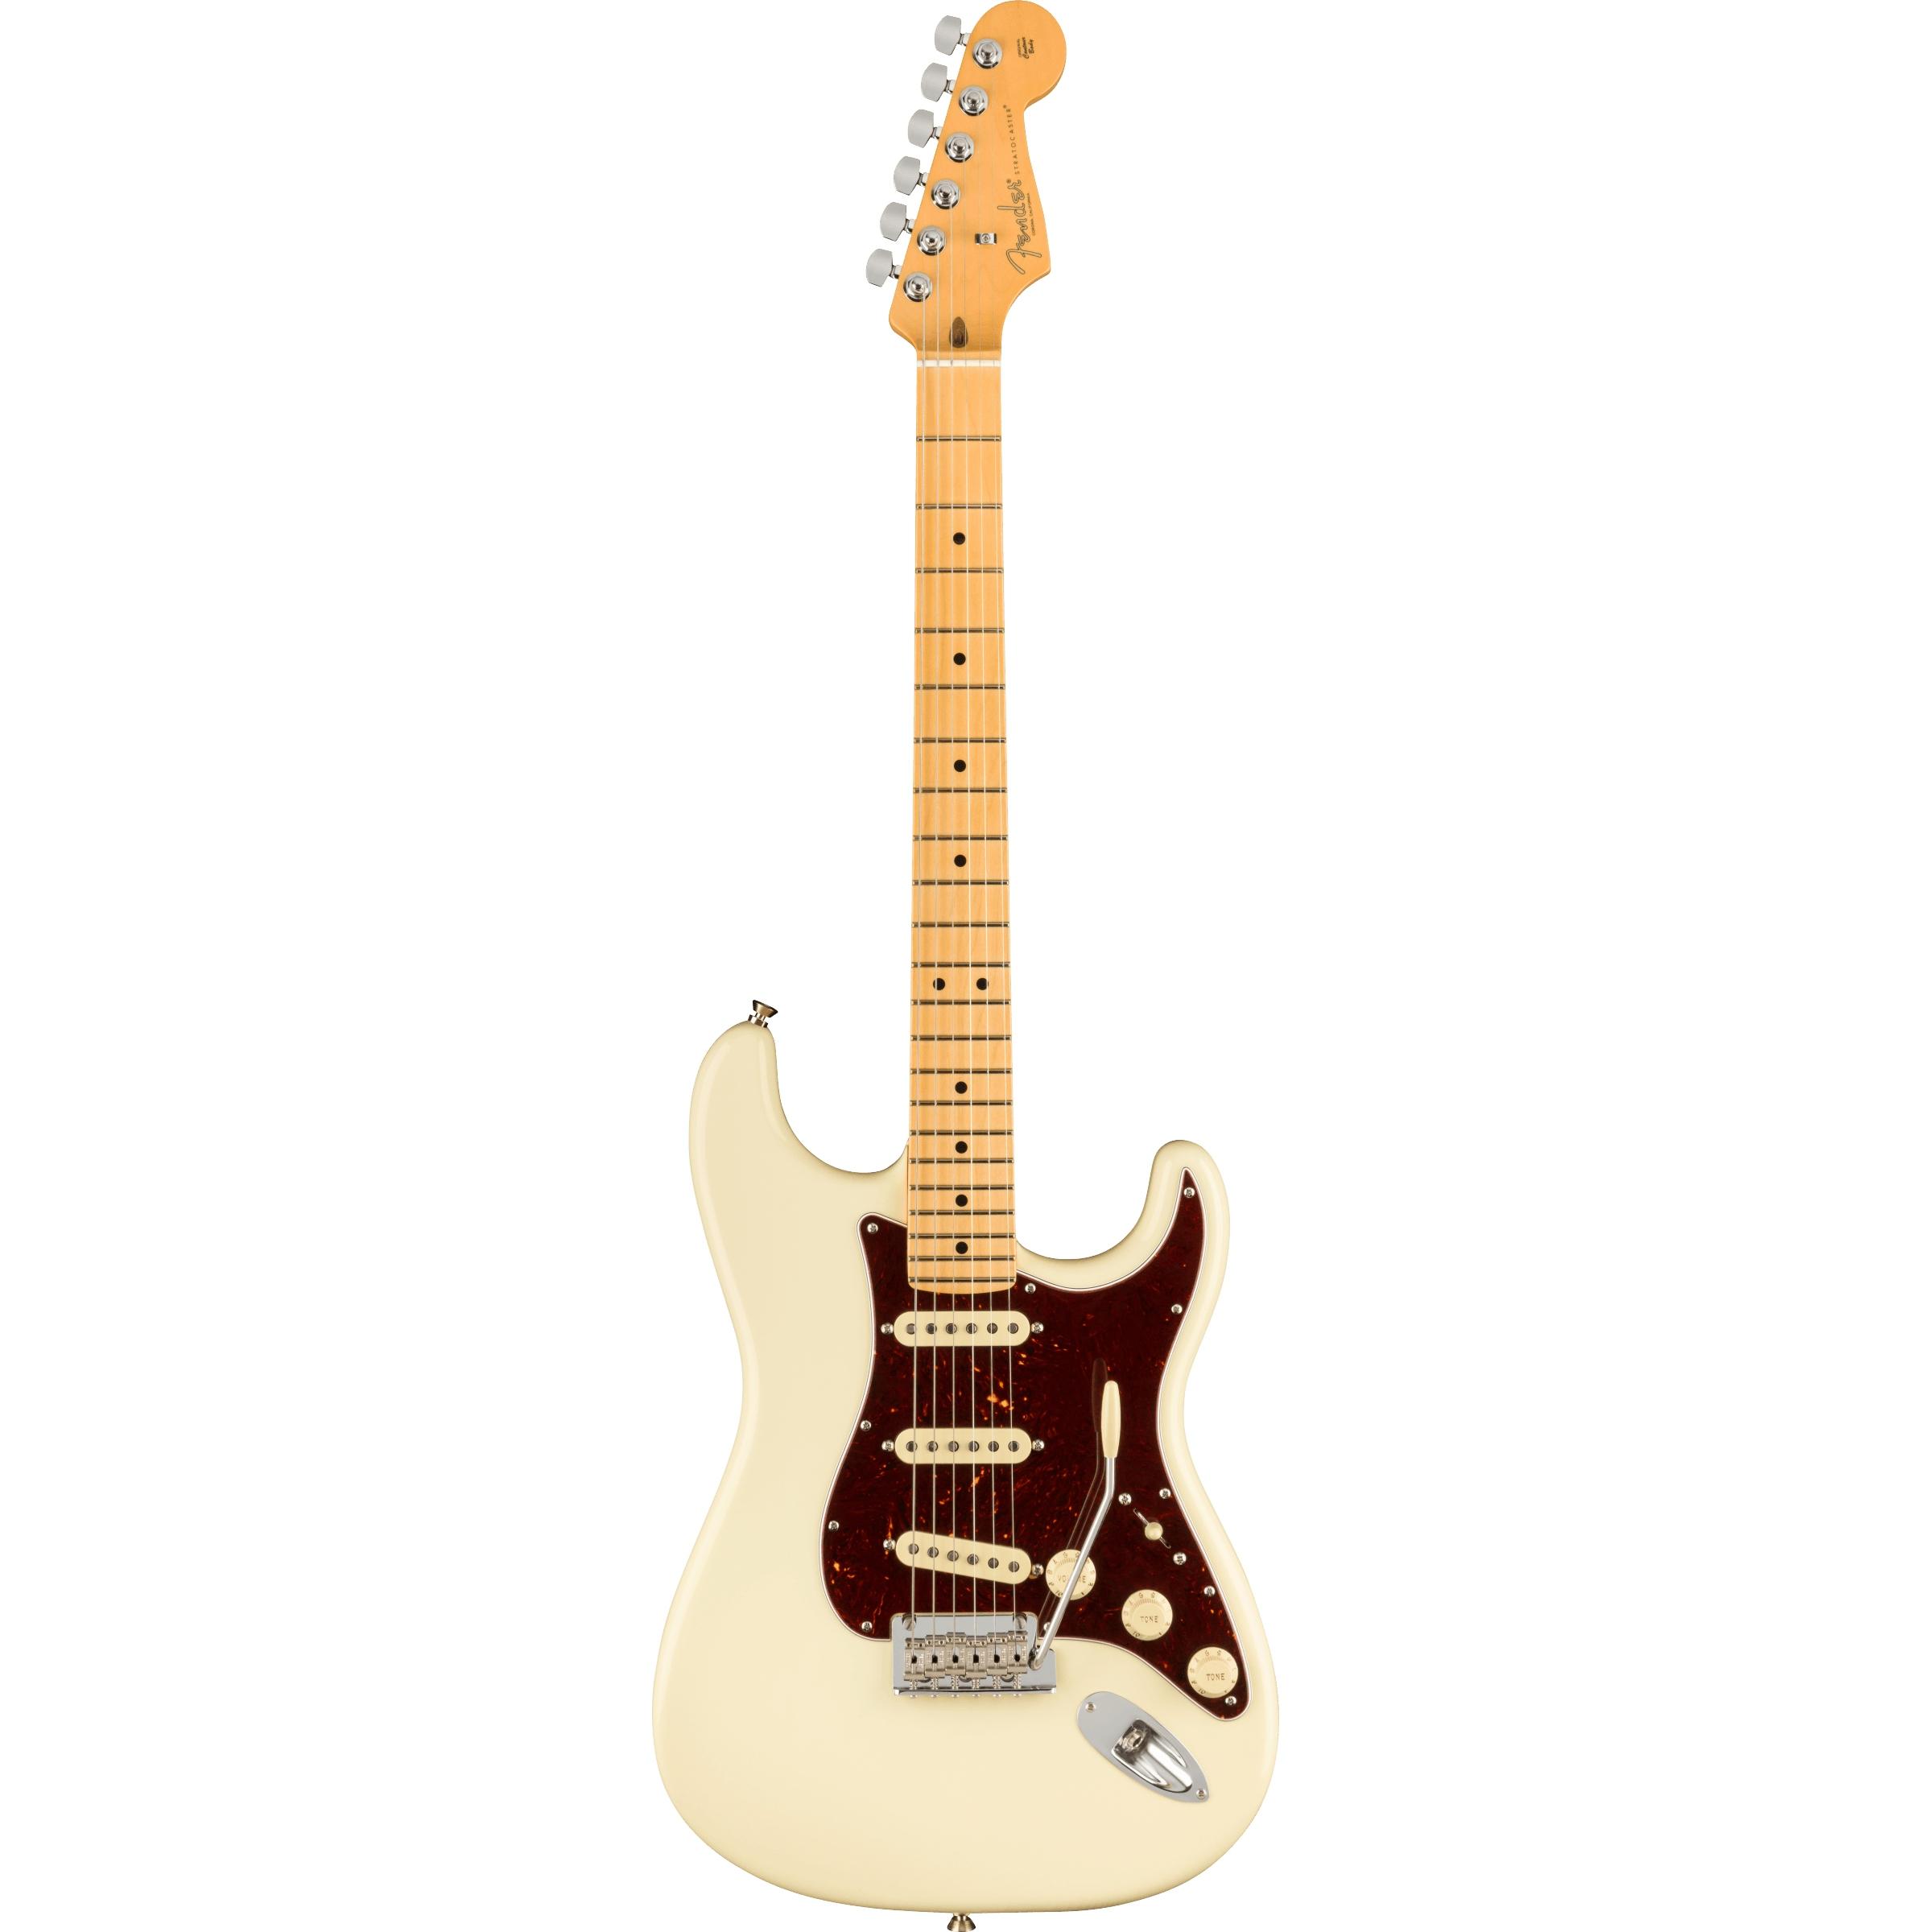 Fender American Pro II Strat MN Olympic White